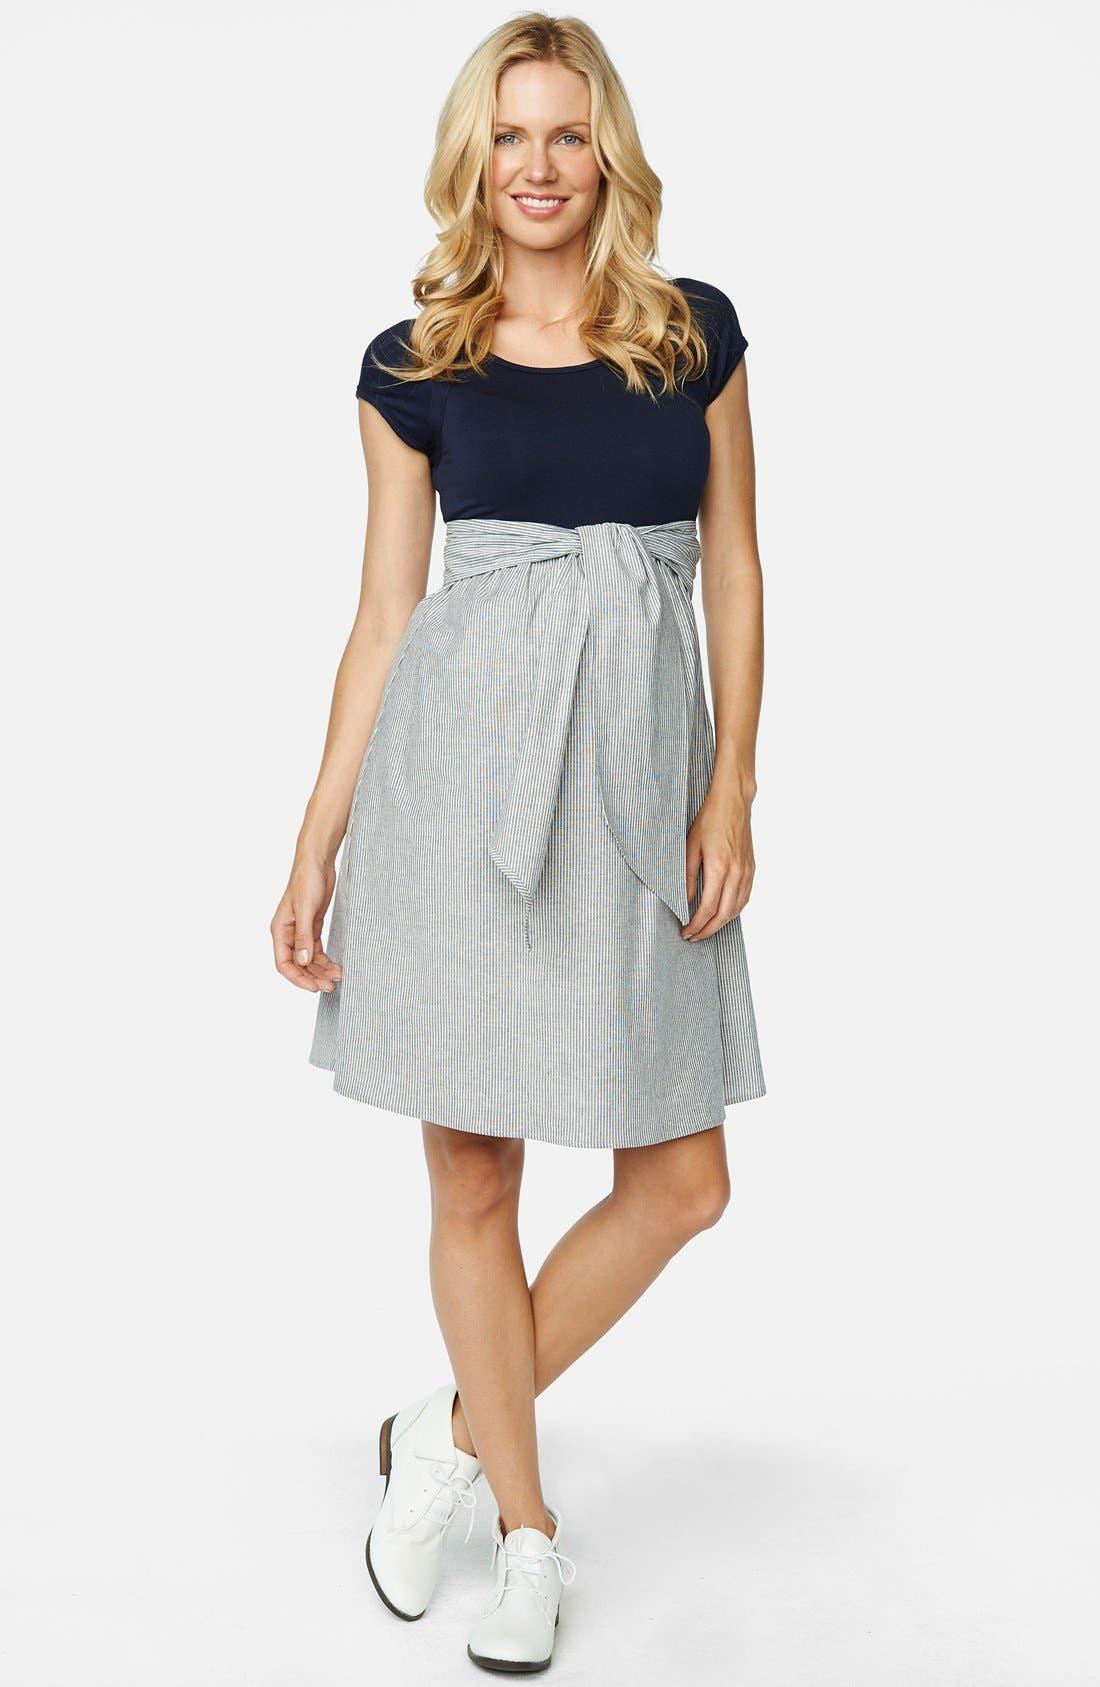 Alternate Image 1 Selected - Maternal America Scoop Neck Maternity Dress